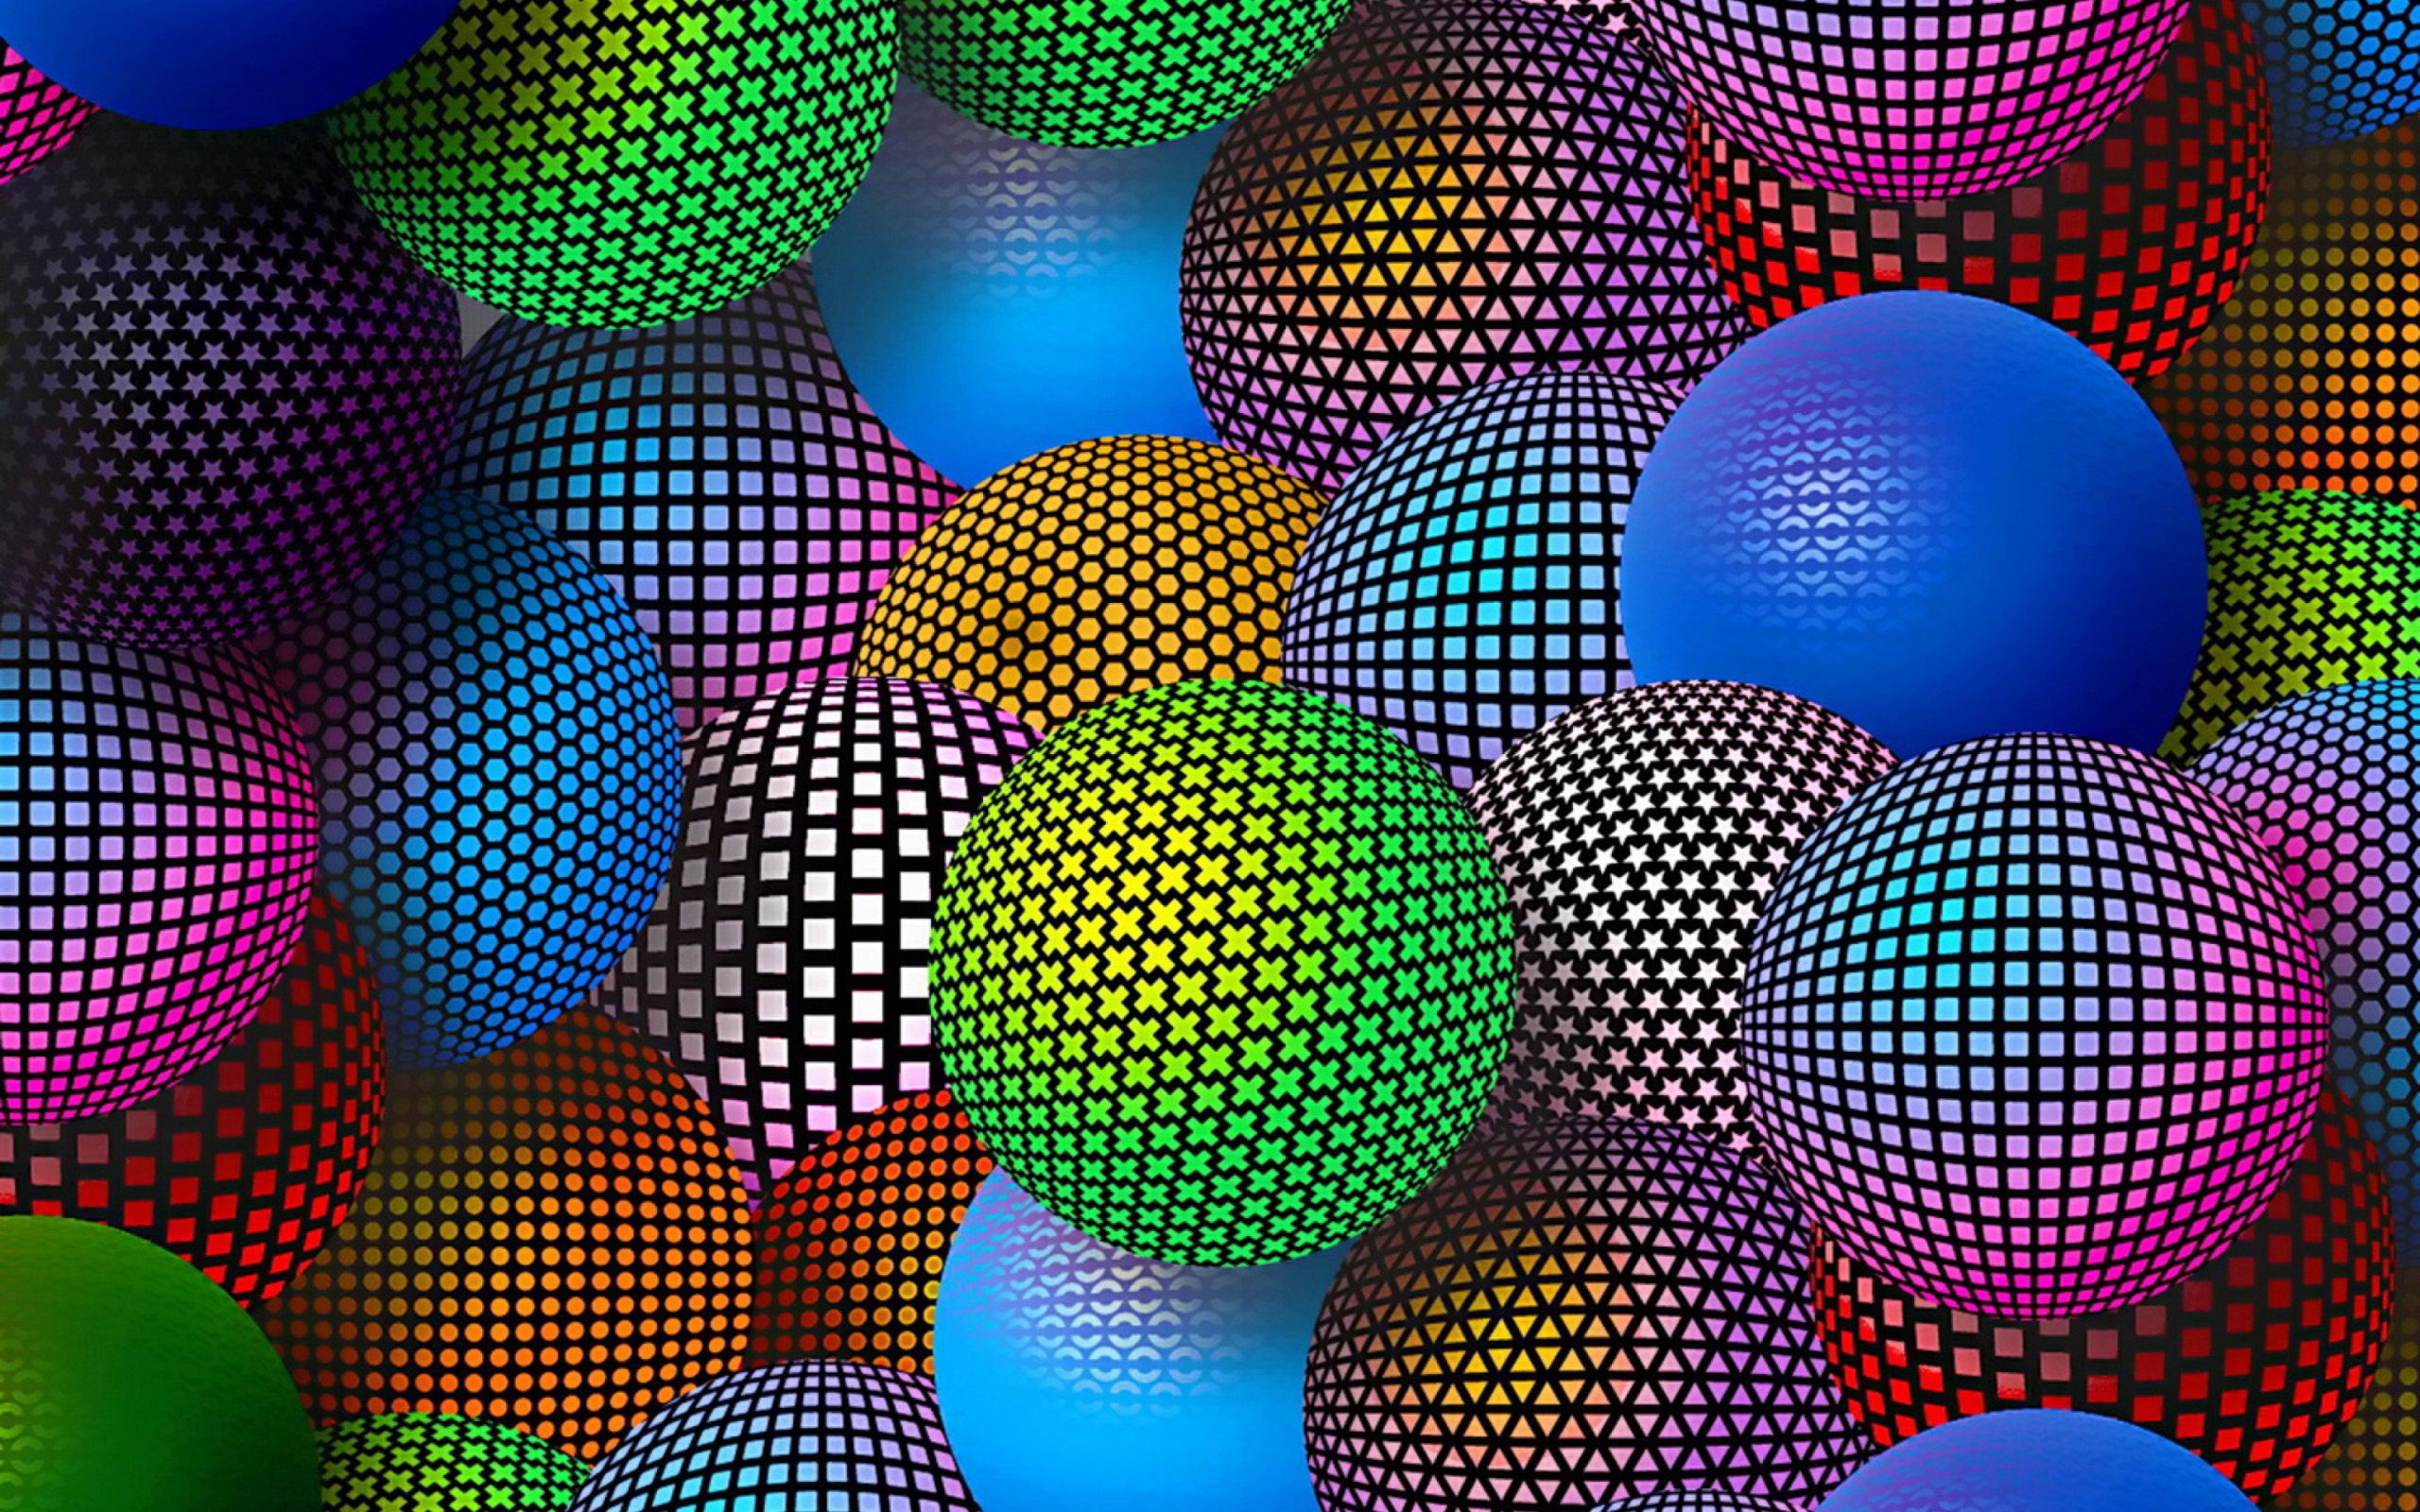 3d Neon Desktop Wallpapers 3d Wallpapers Mobile Free Download Xp Pc Wallpapers